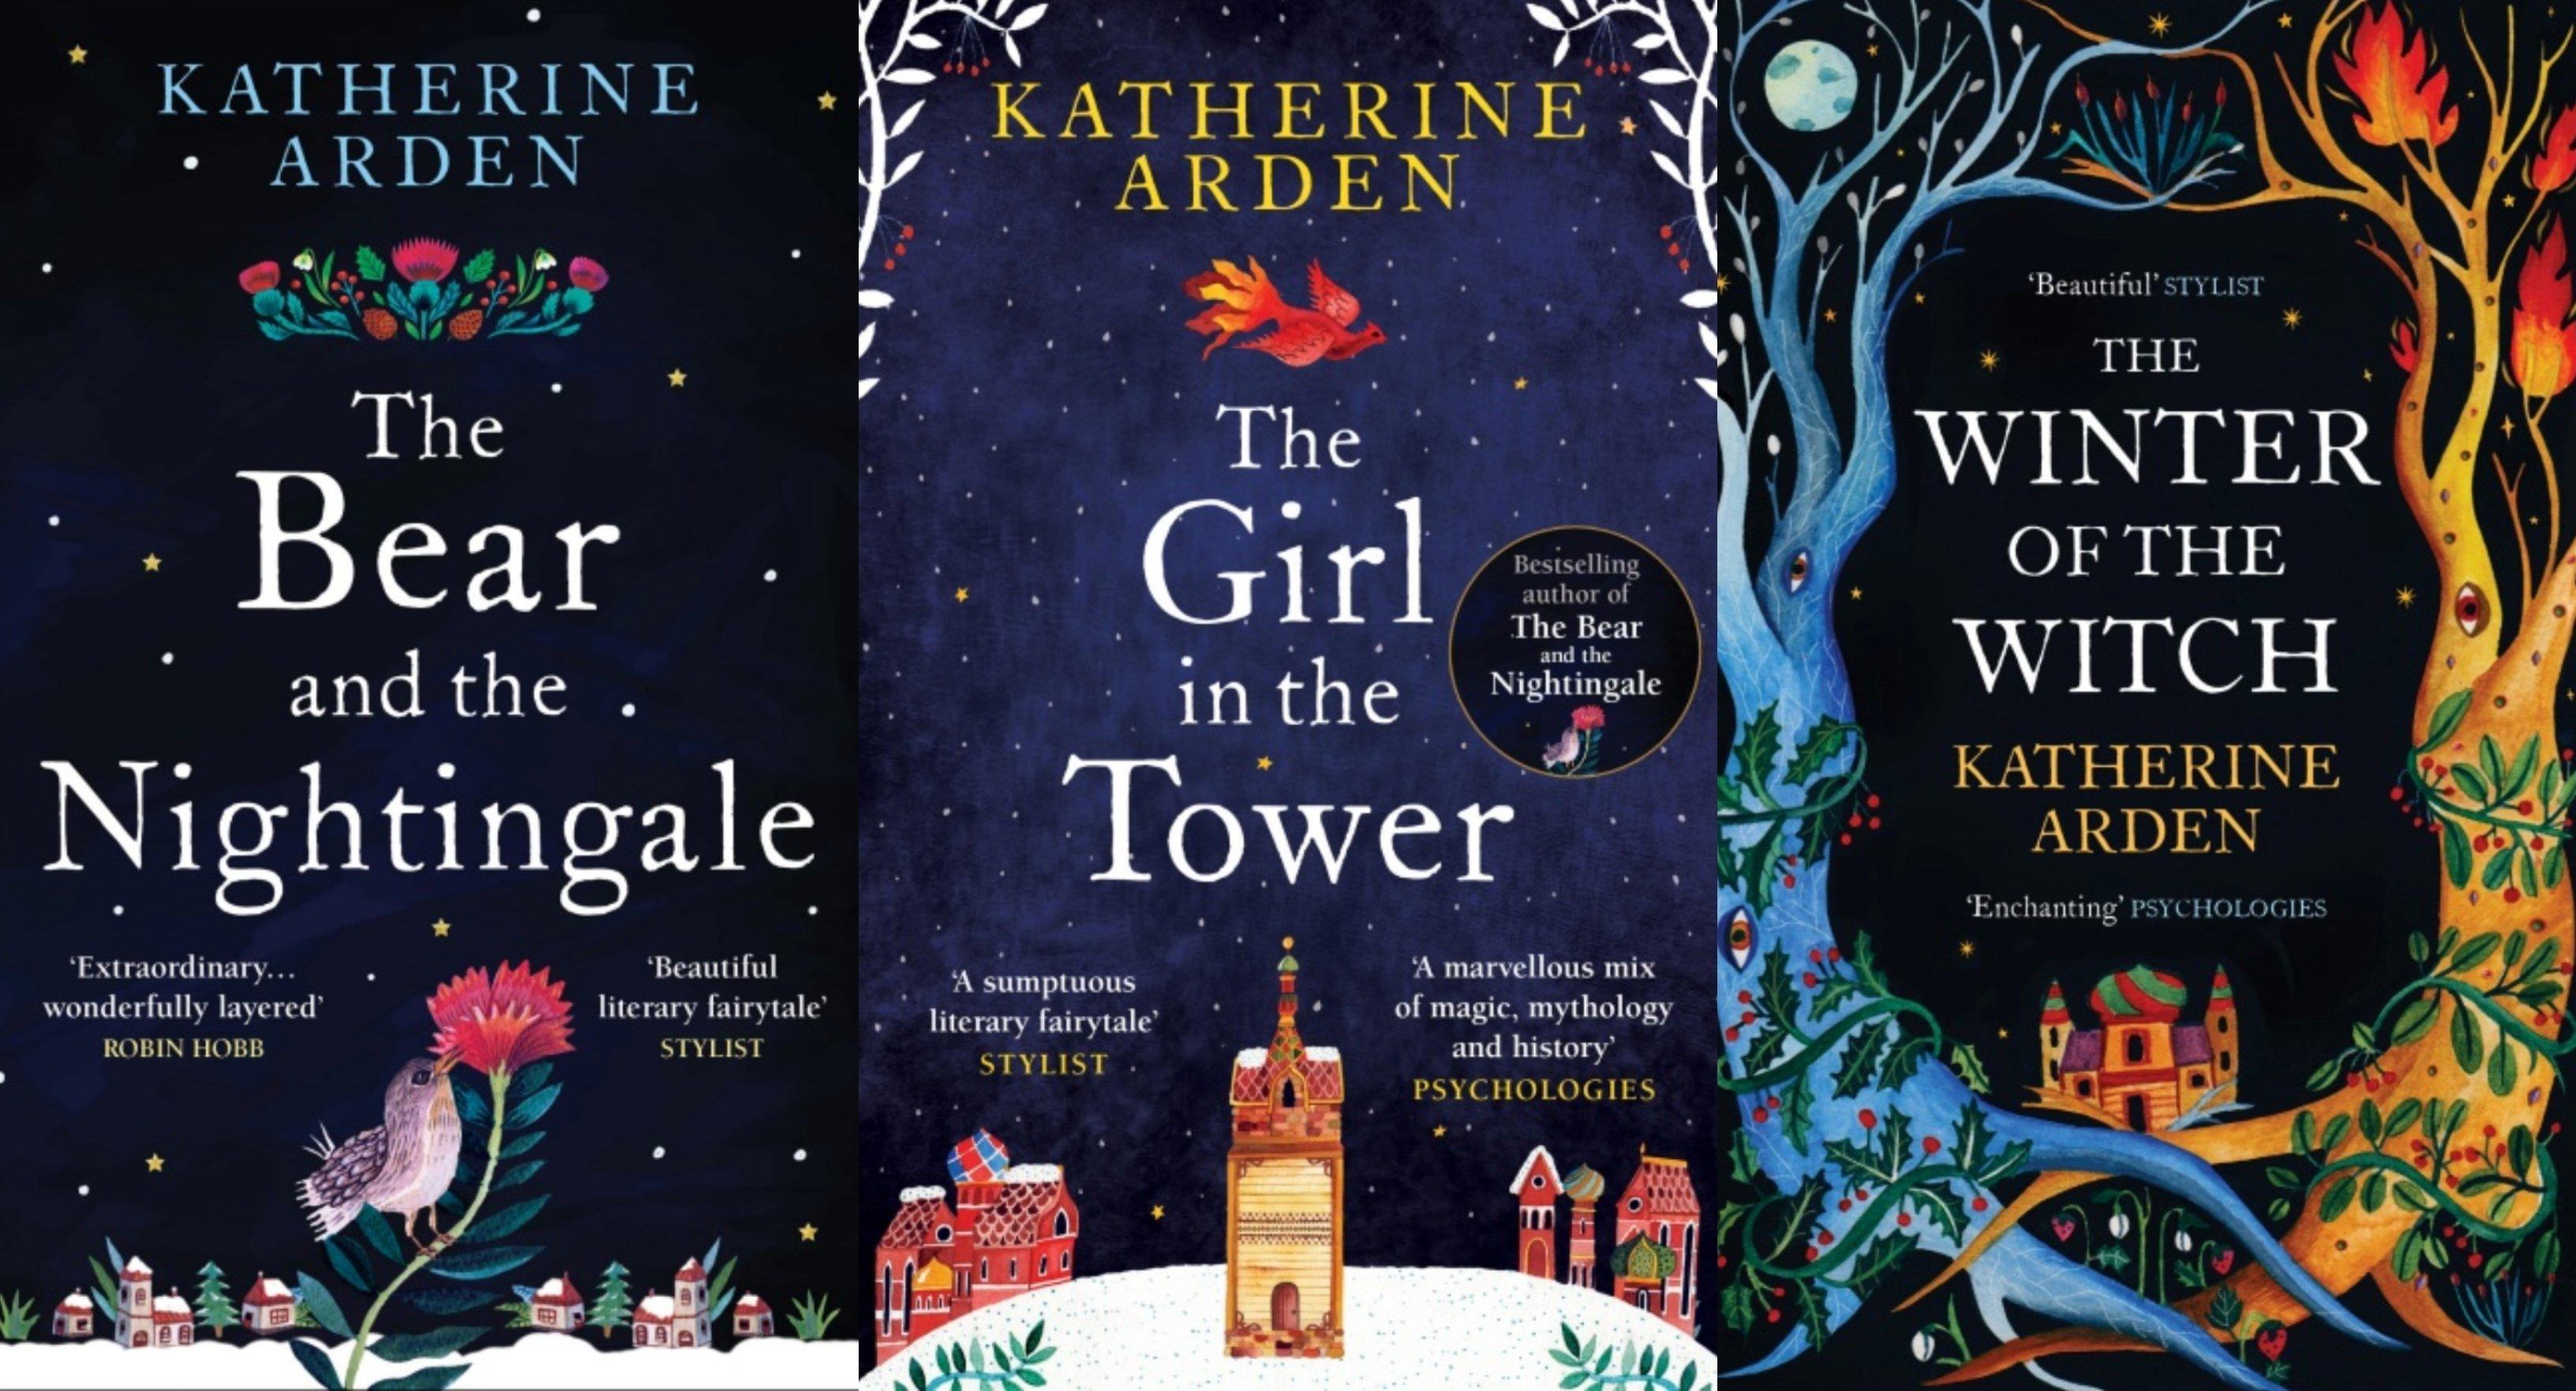 Katherine Arden's 'Winternight Trilogy' Is A Heady Mix Of Politics, Spirits & Wars In Old